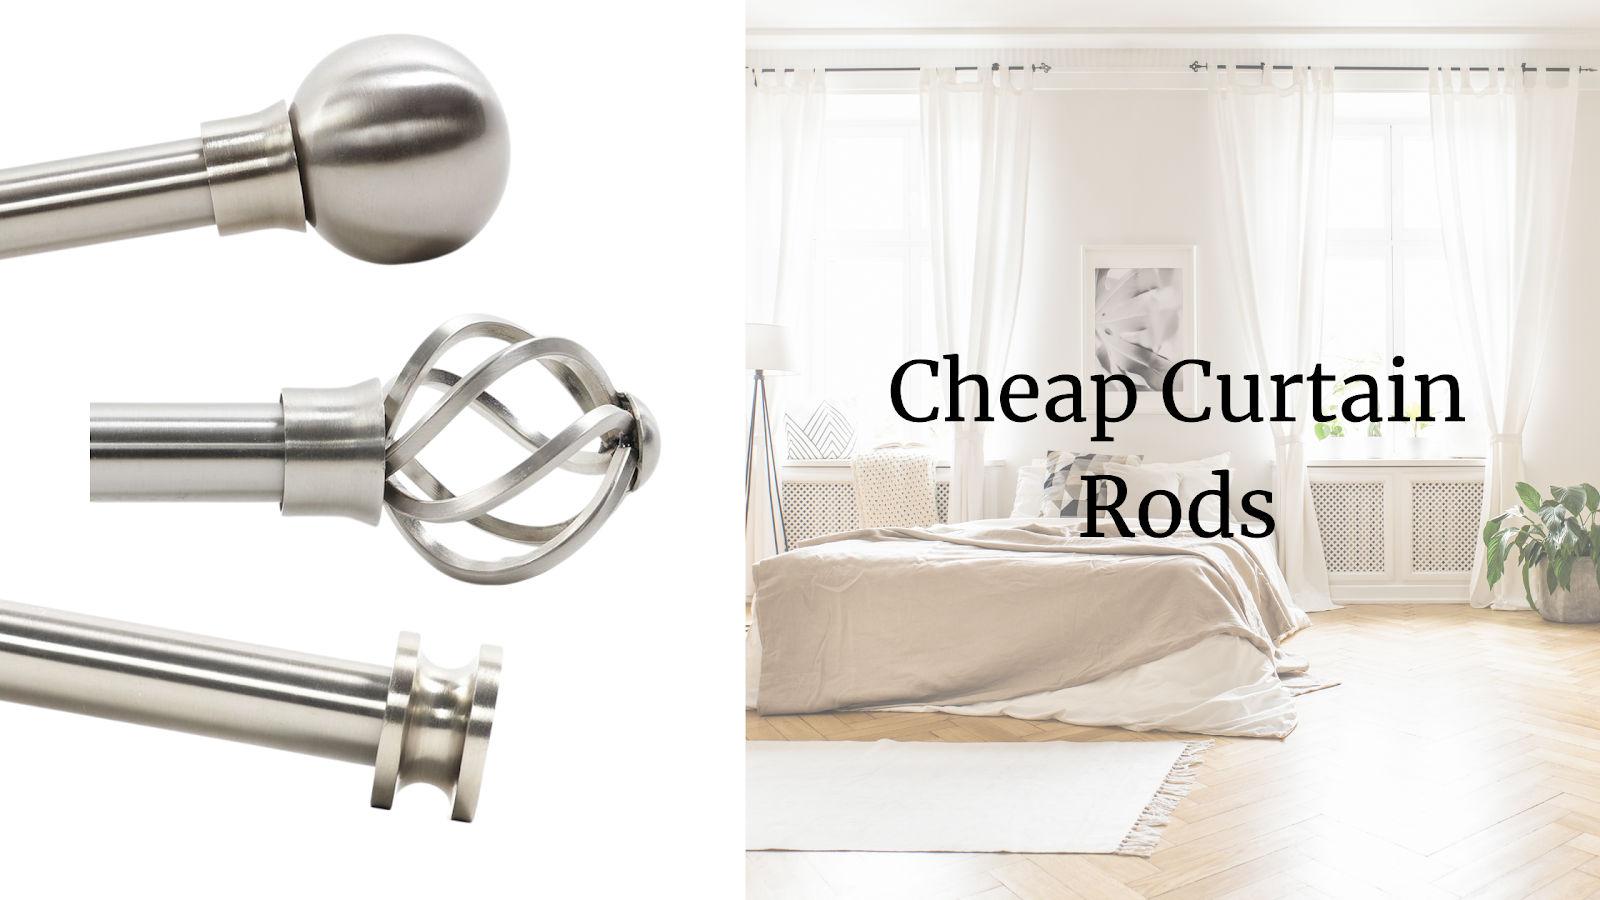 7 tips for choosing a curtain rod